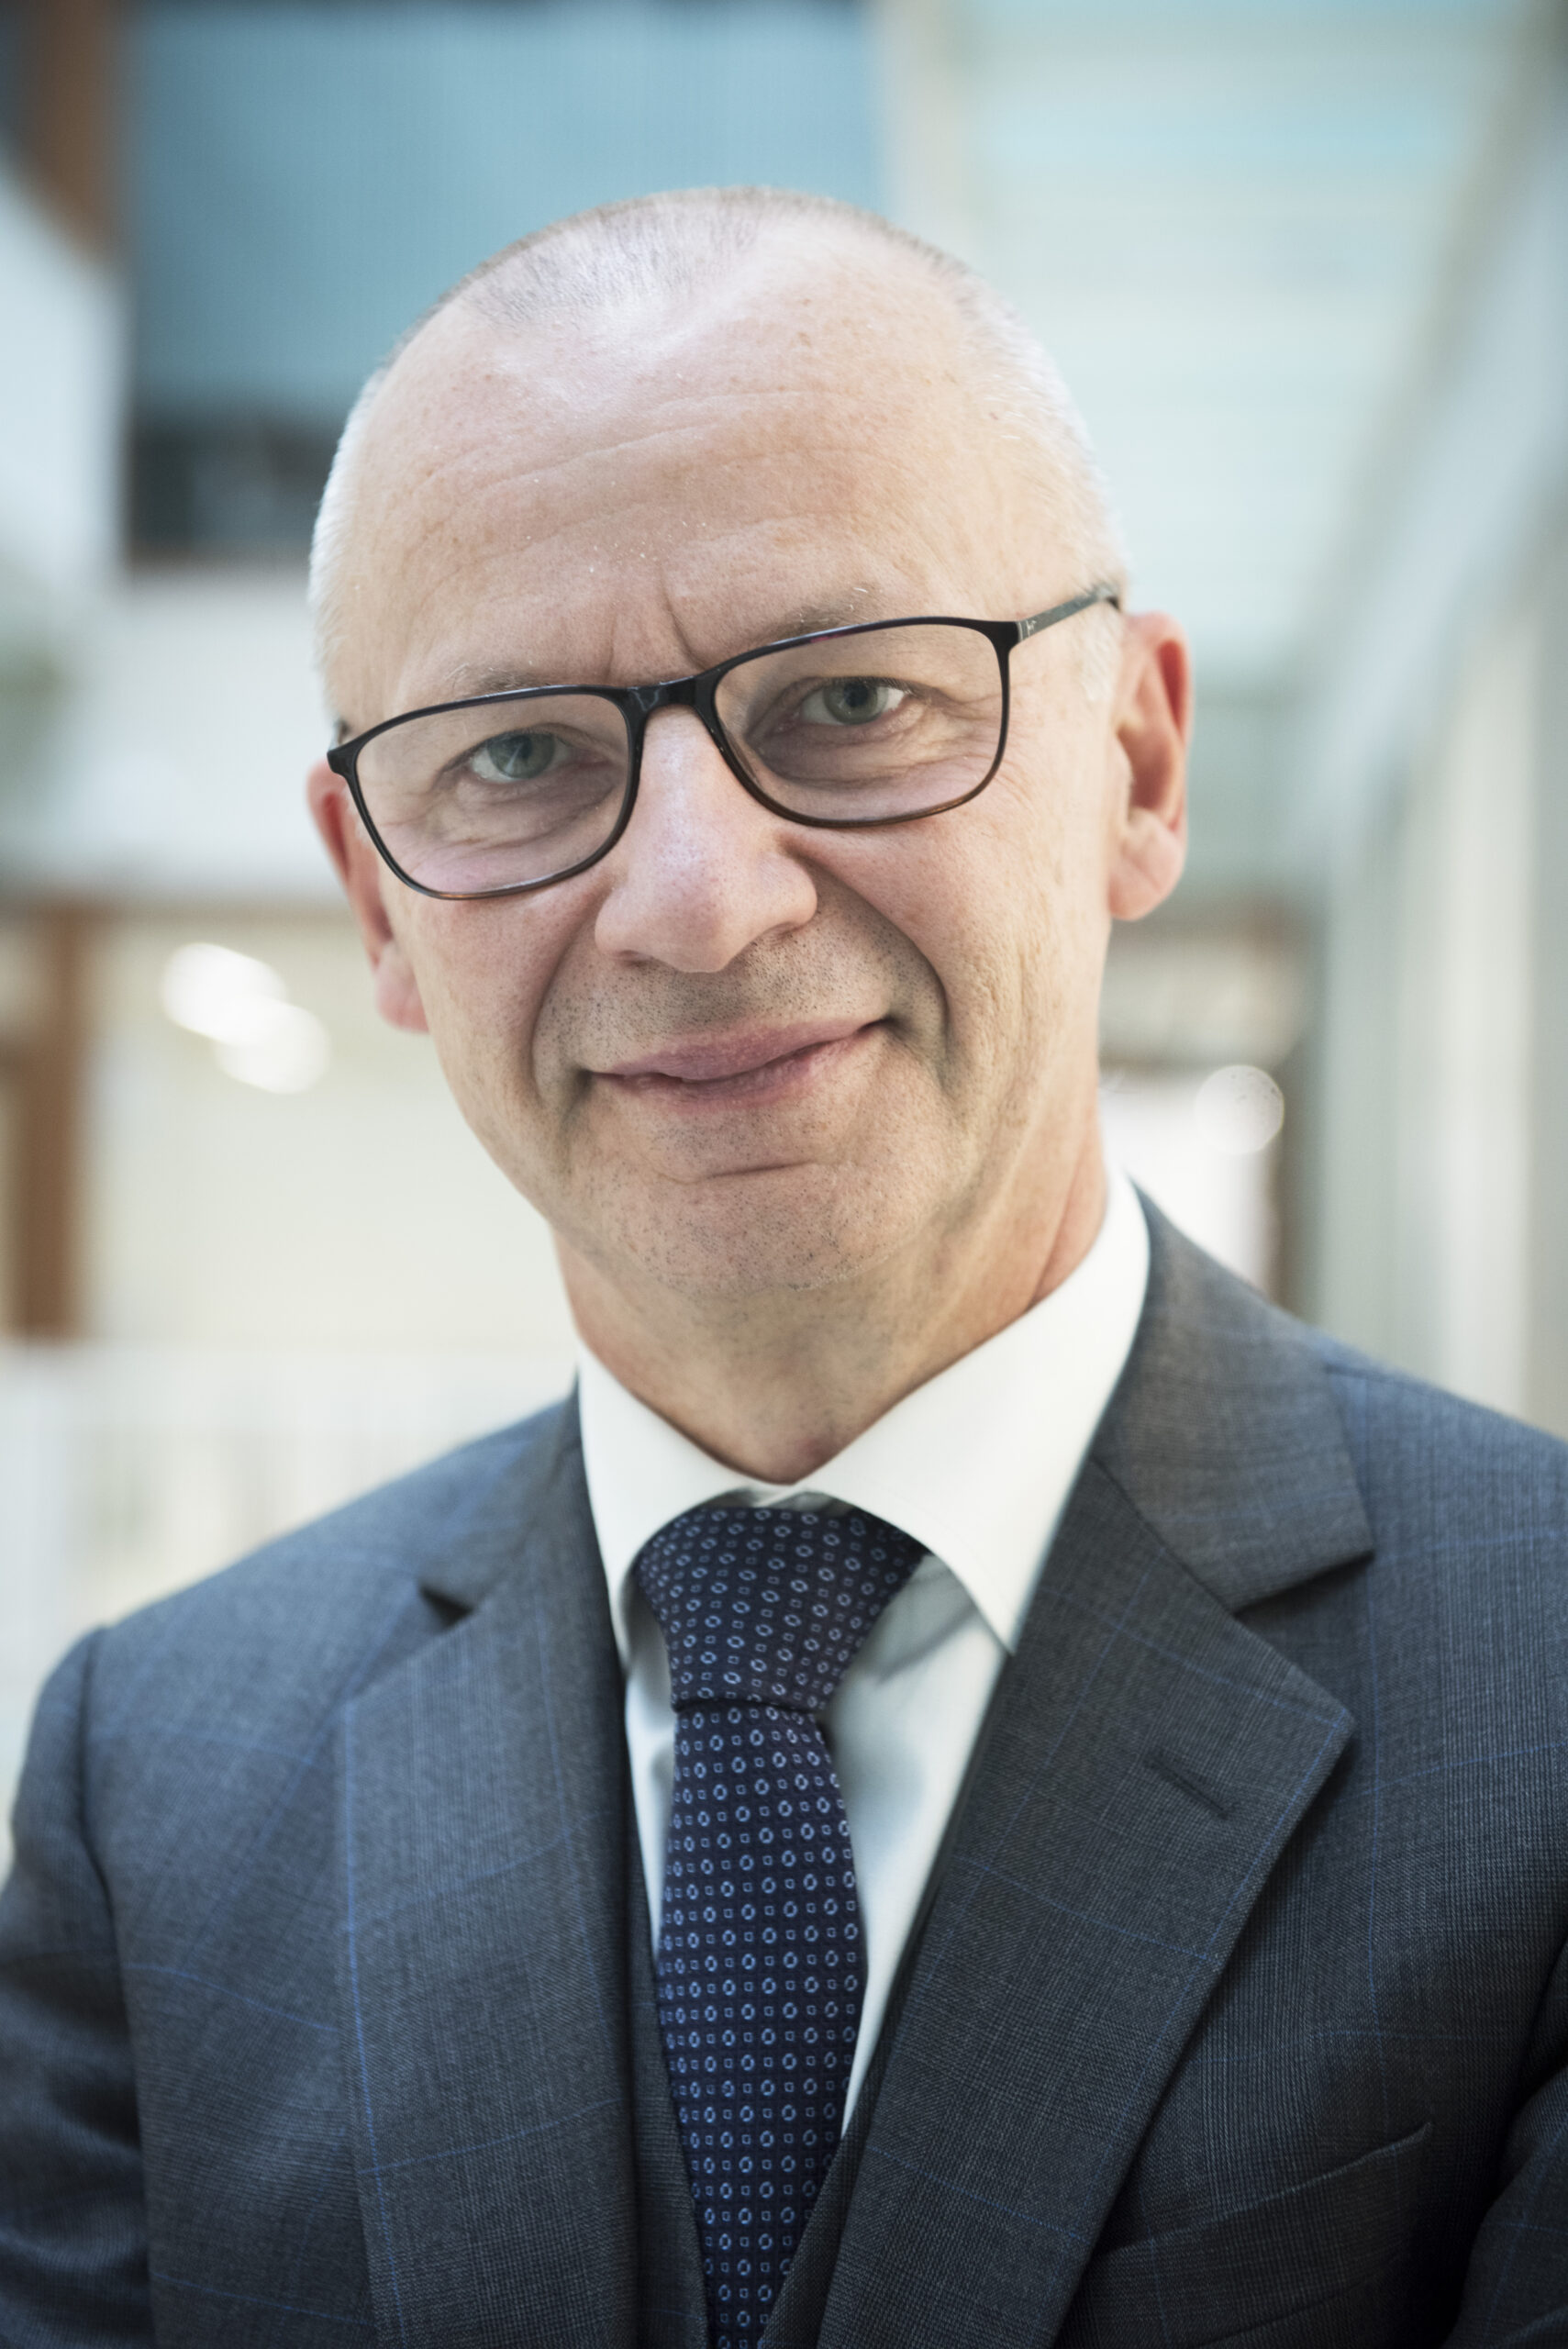 prof. dr. Wim Robberecht, CEO UZ Leuven © UZ Leuven